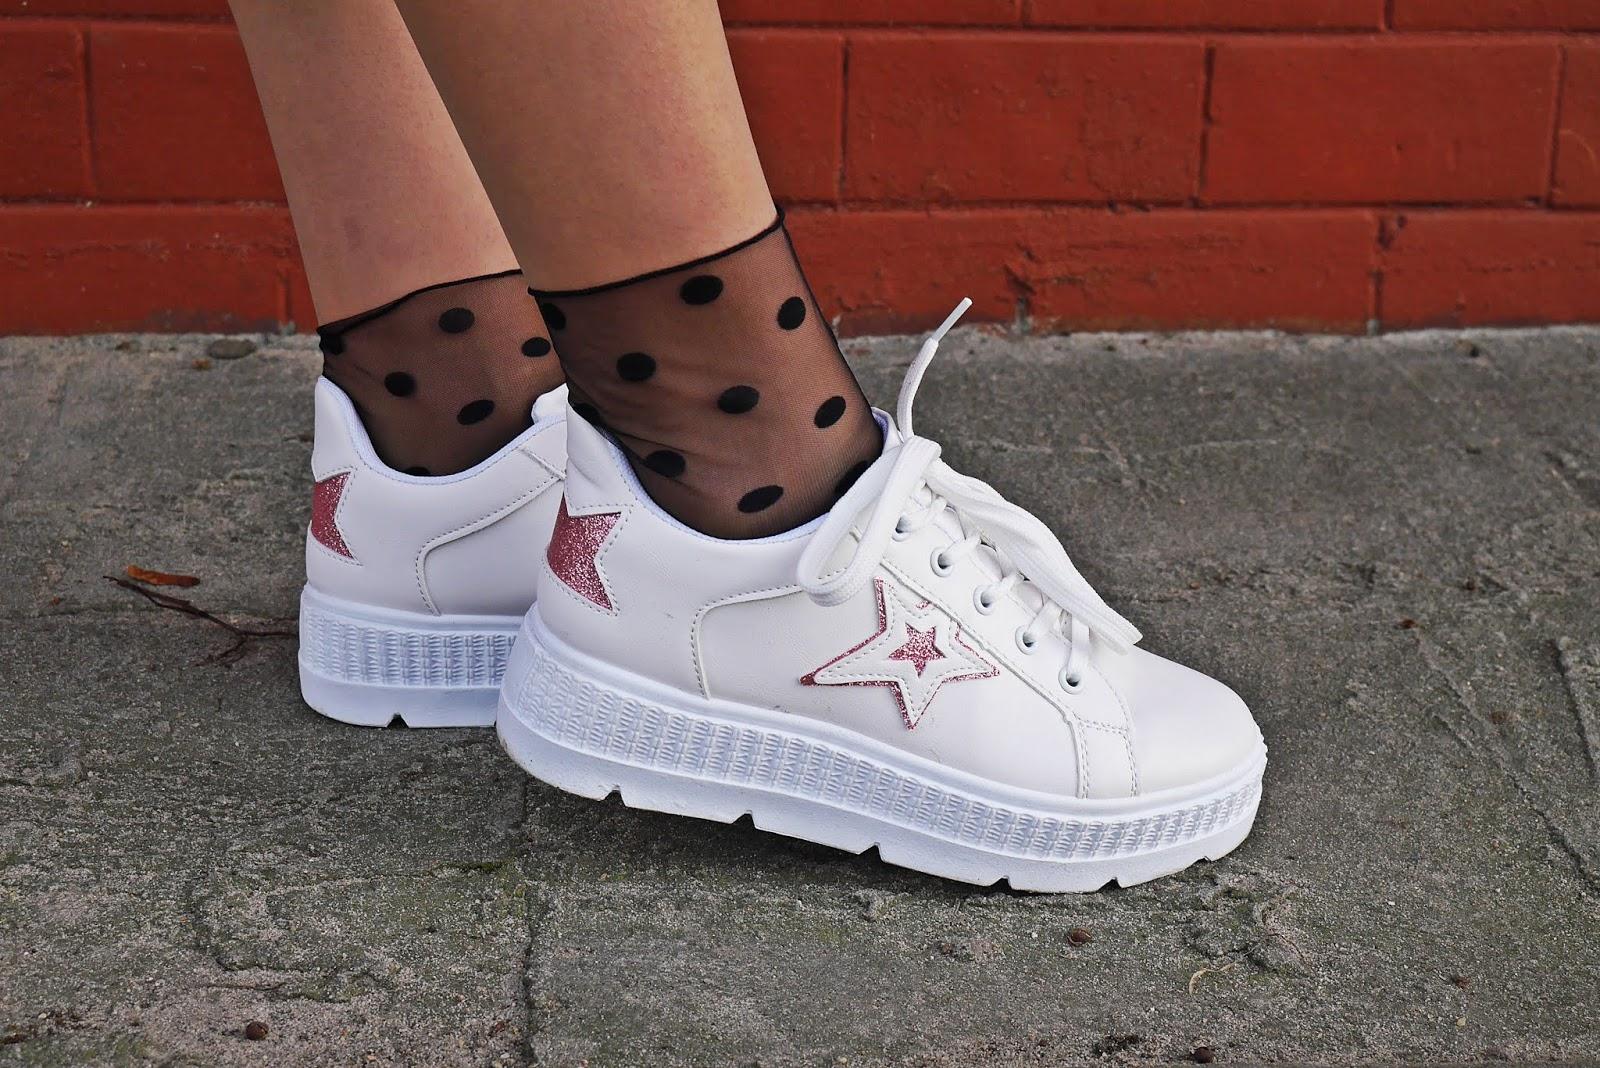 białe buty platformy sneakersy renee skarpetki karyn blog modowy